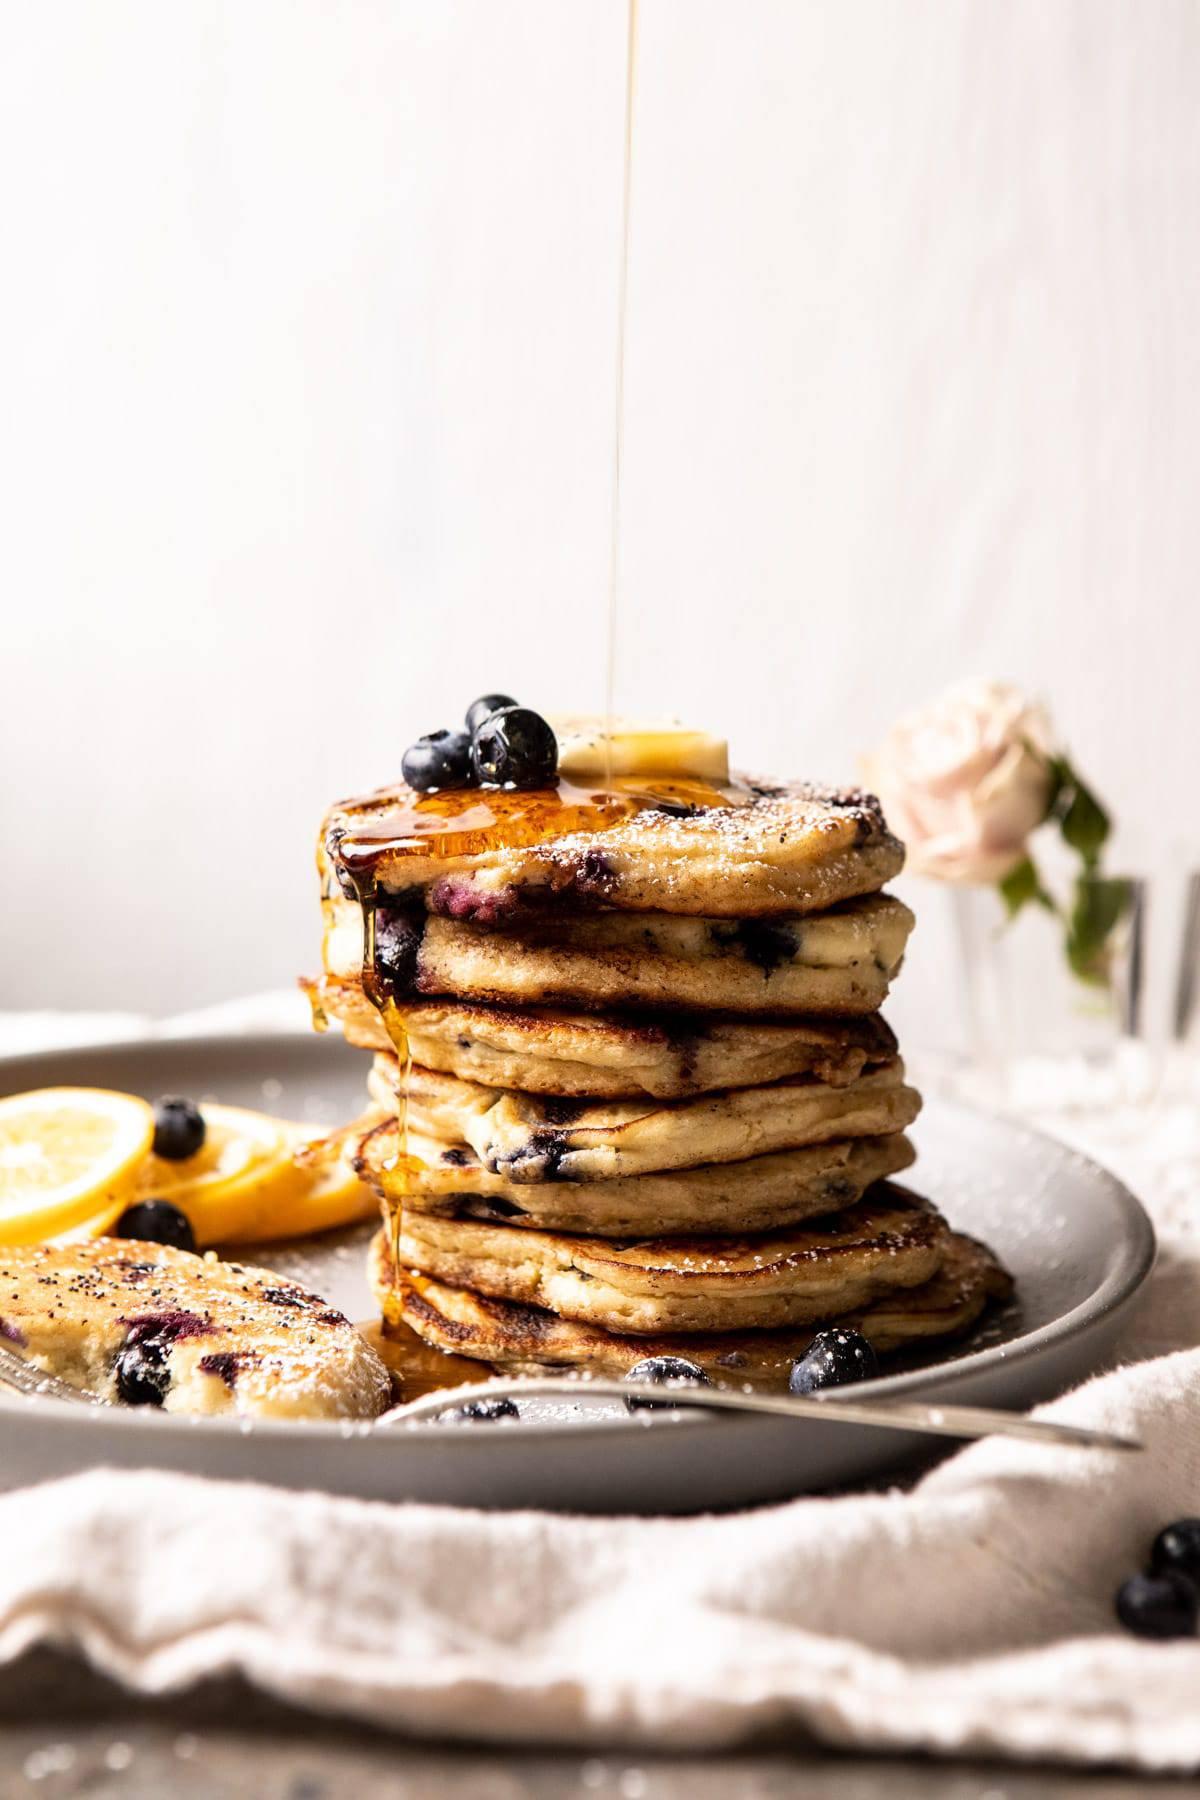 Blueberry Lemon Ricotta Pancakes | halfbakedharvest.com #blueberrypancakes #pancakes #brunch #breakfast #lemon